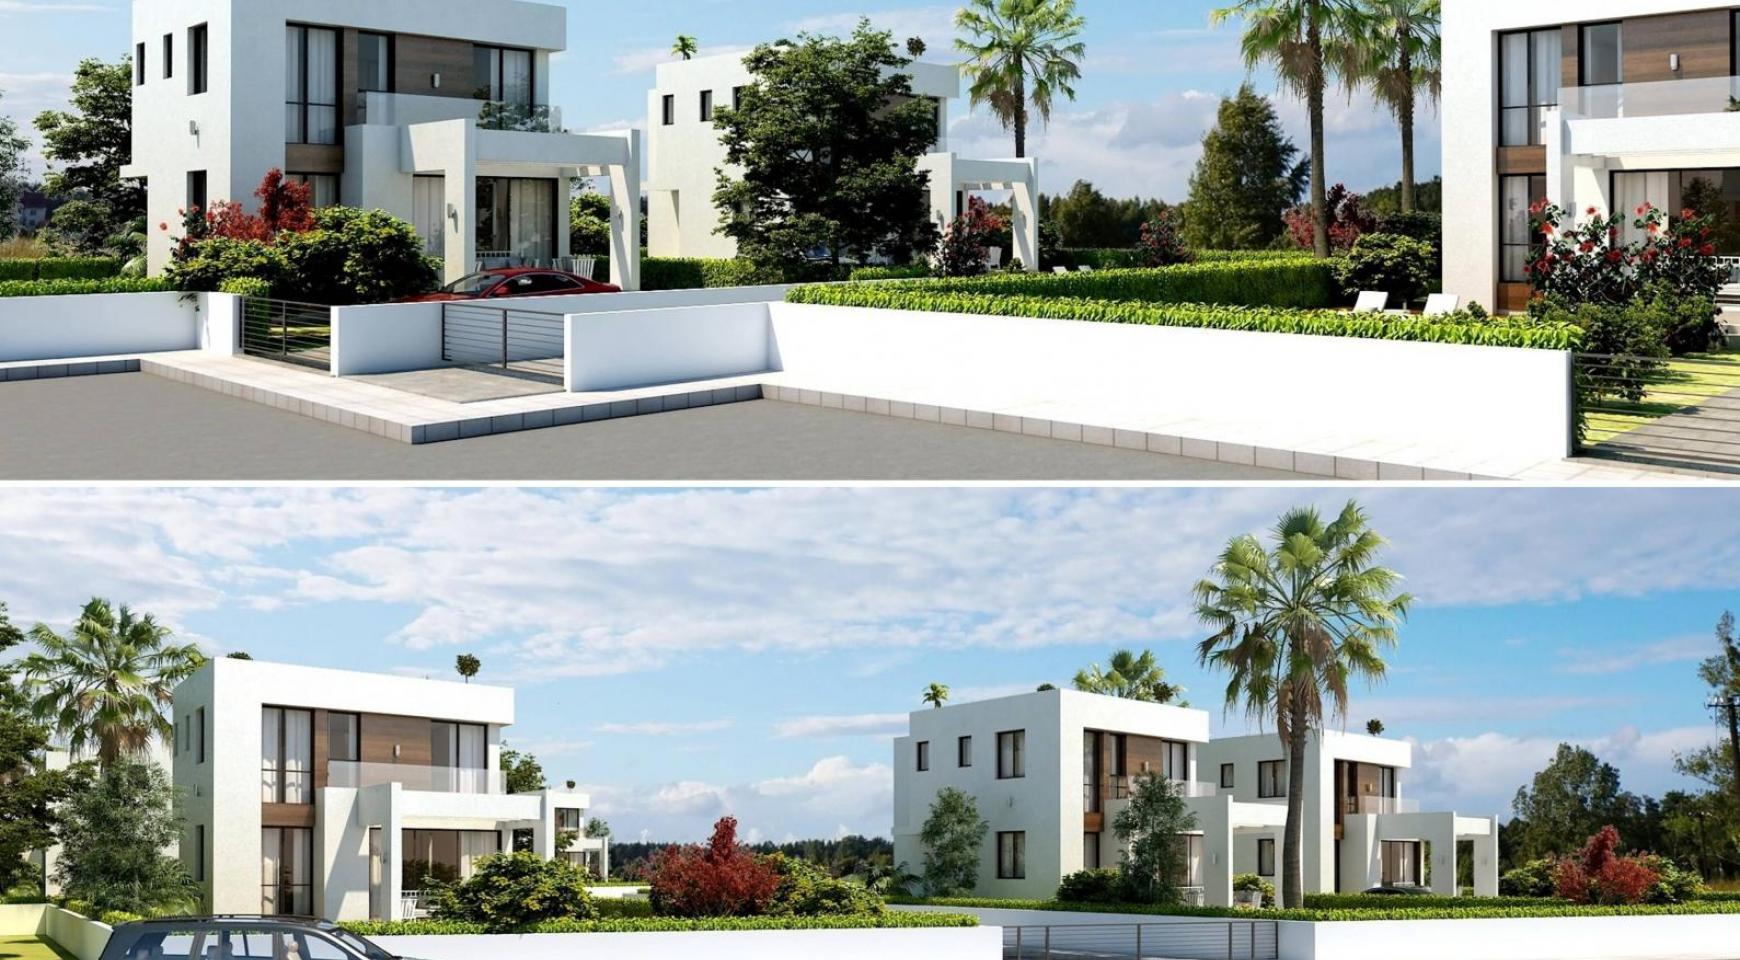 Modern 3 Bedroom Villa in a Complex near the Beach - 10